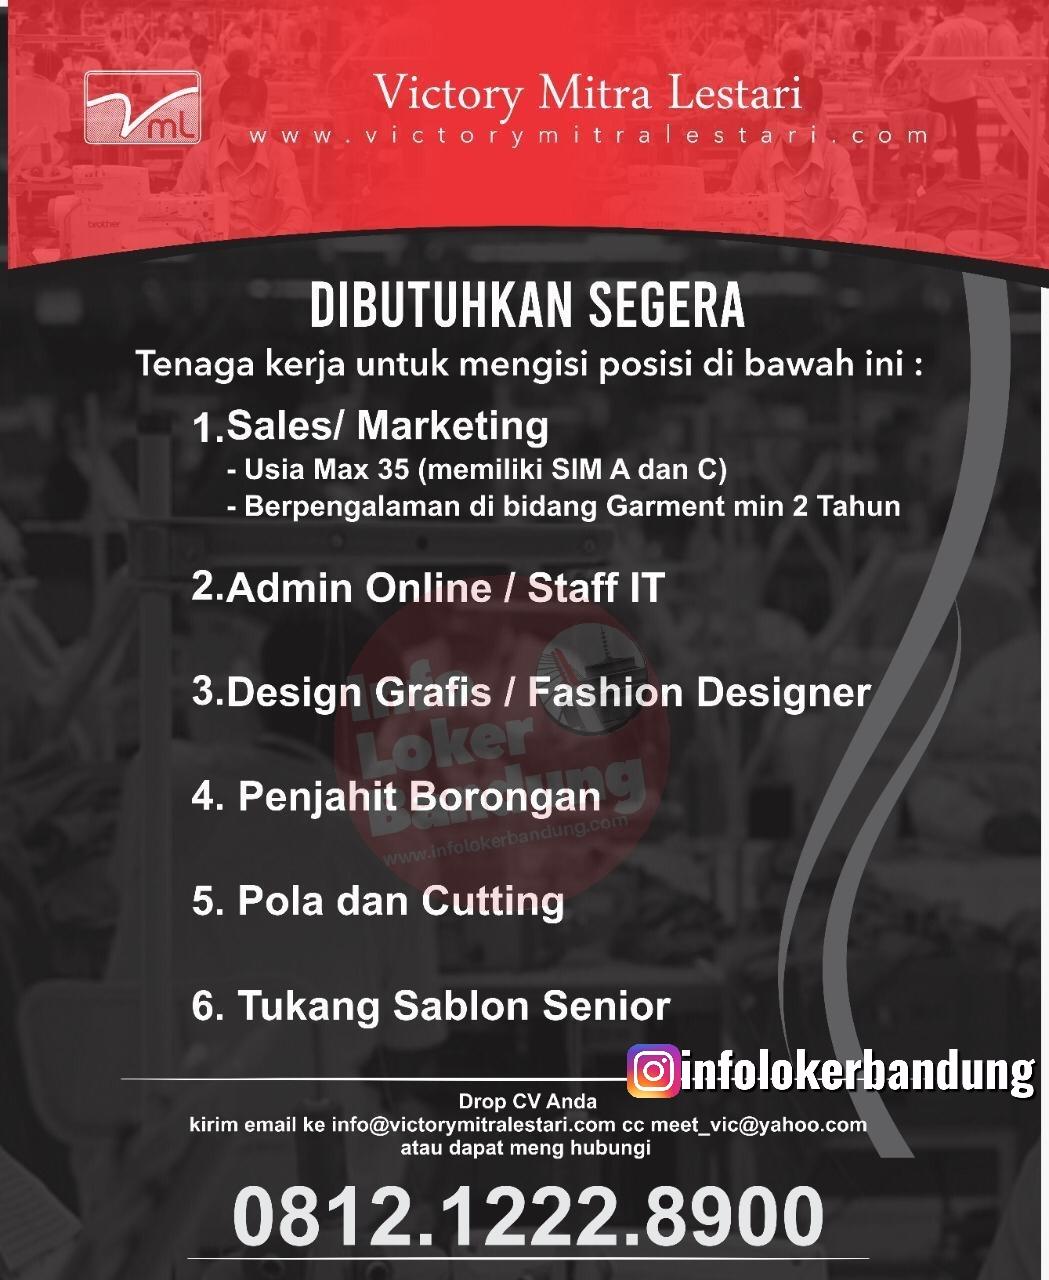 Lowongan Kerja CV. Victory Mitra Lestari Bandung Desember 2019